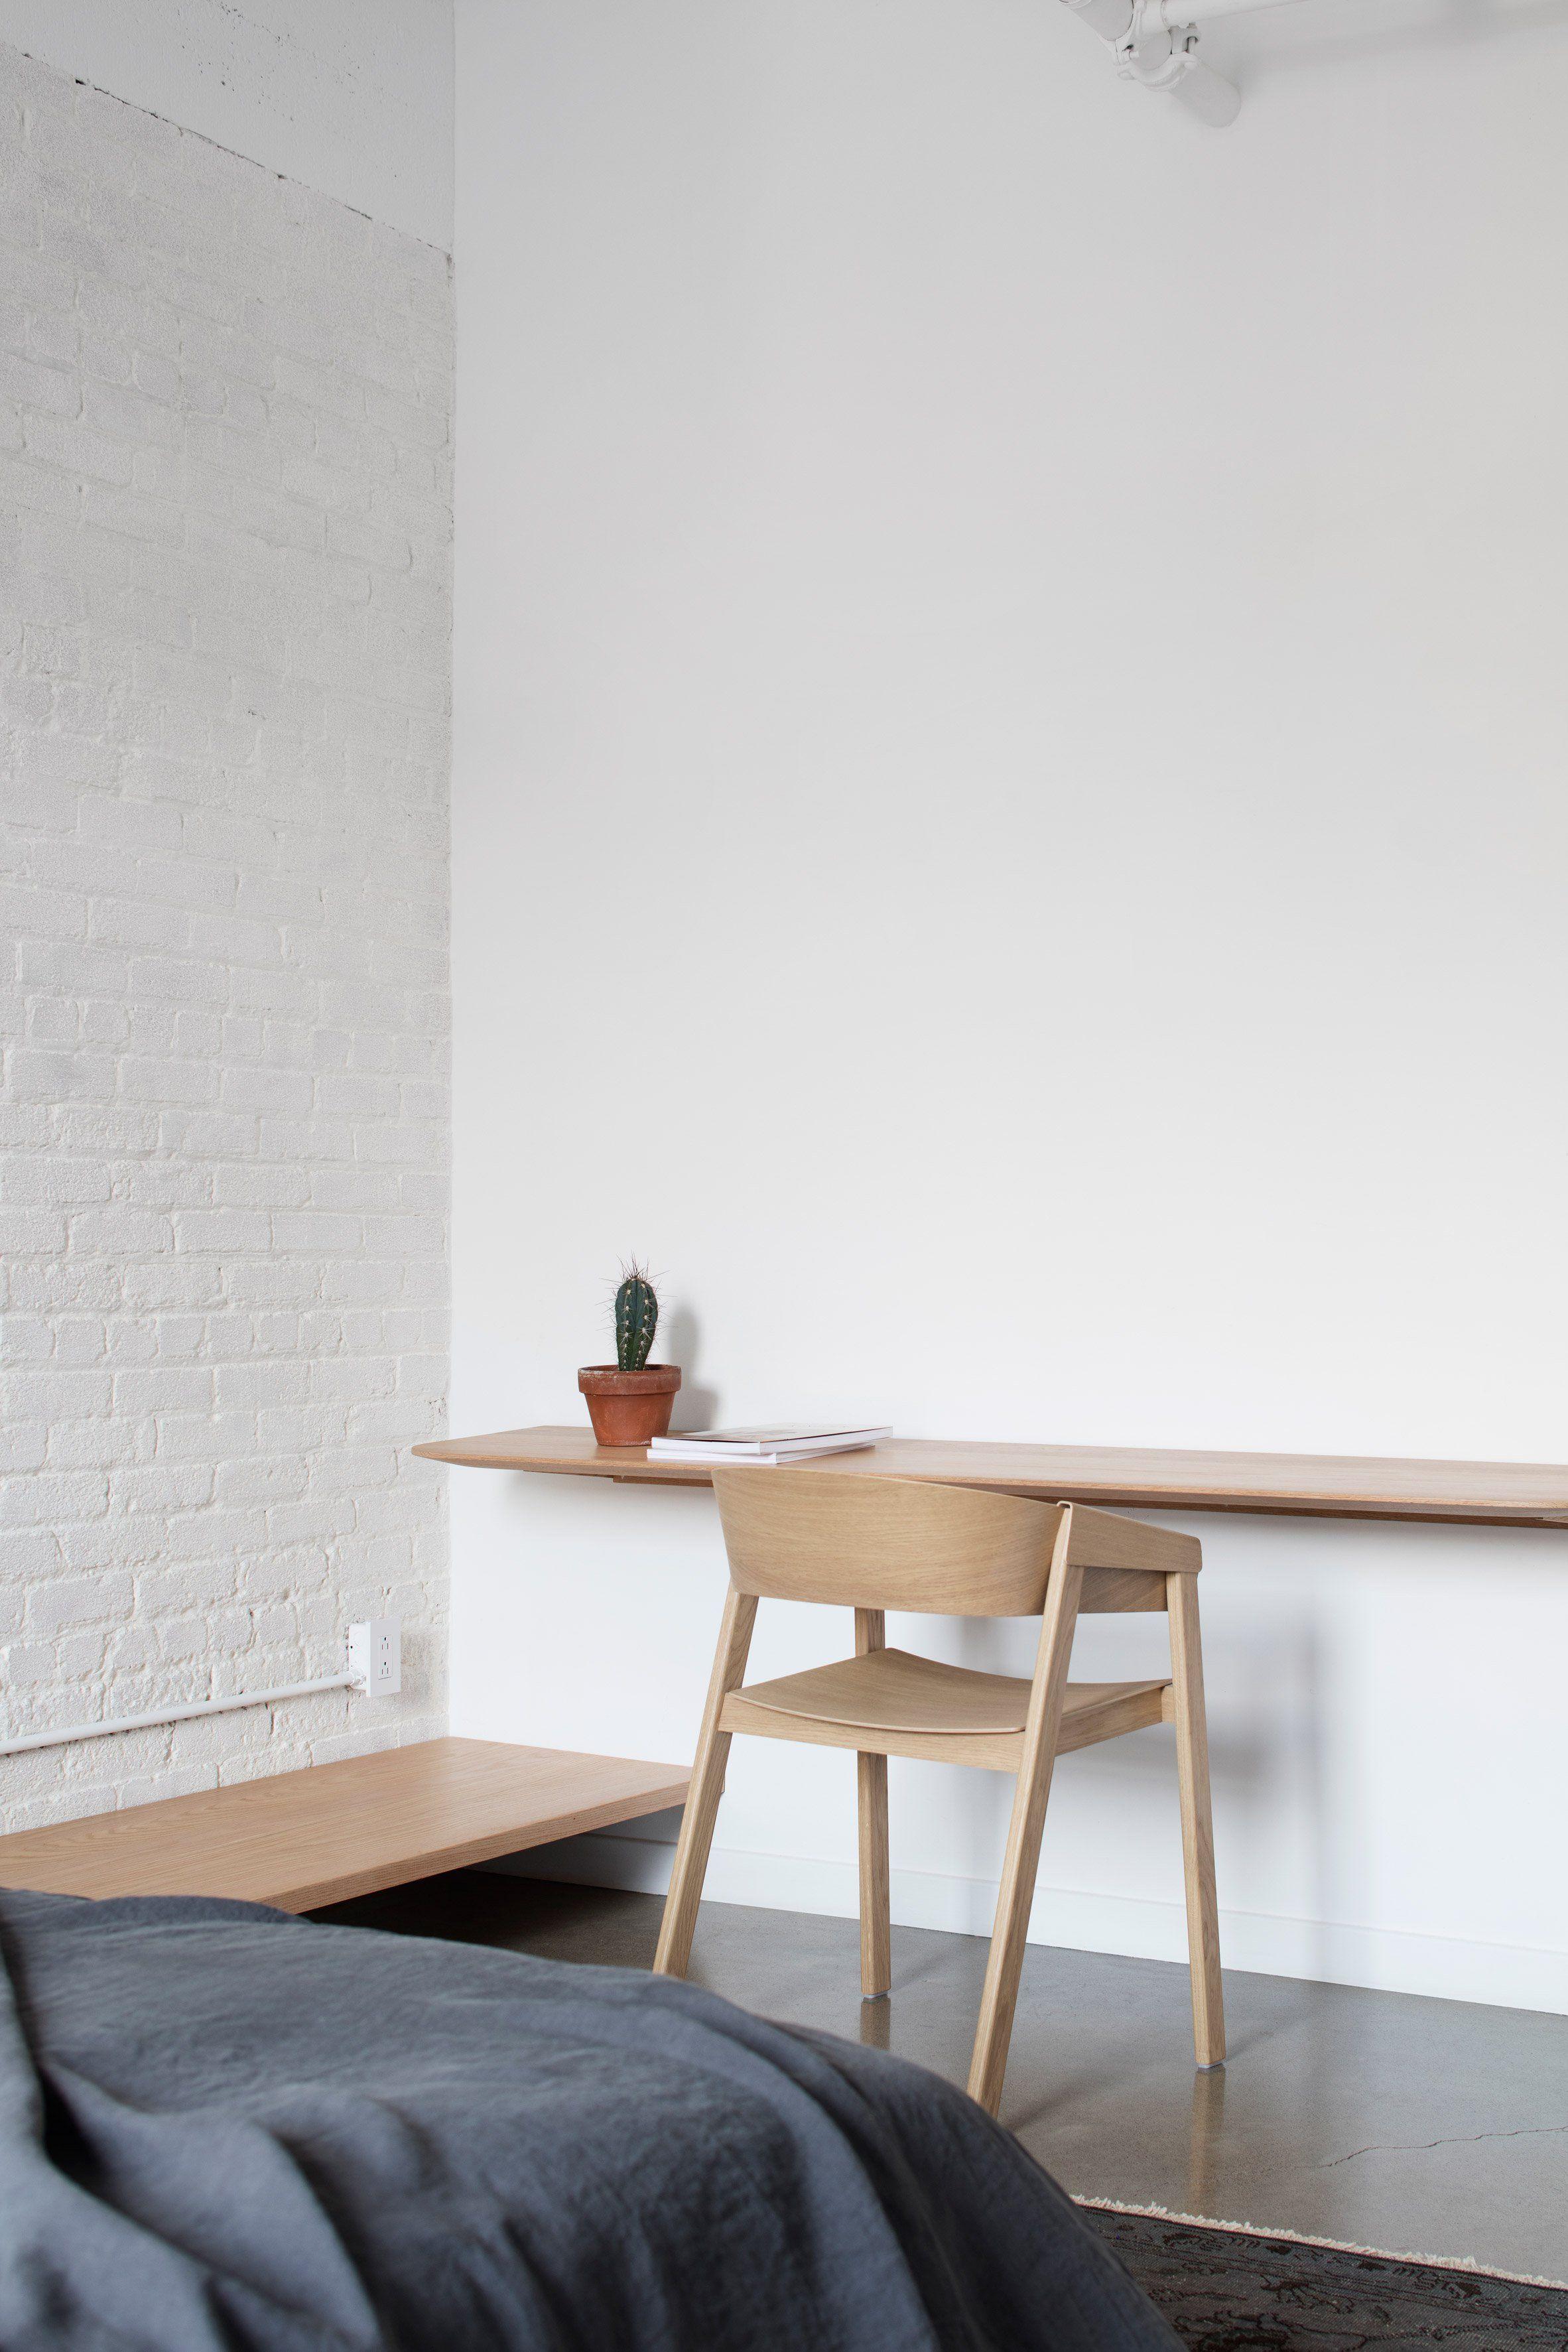 Atelier Barda Renovates Montreal Apartment With Minimalist